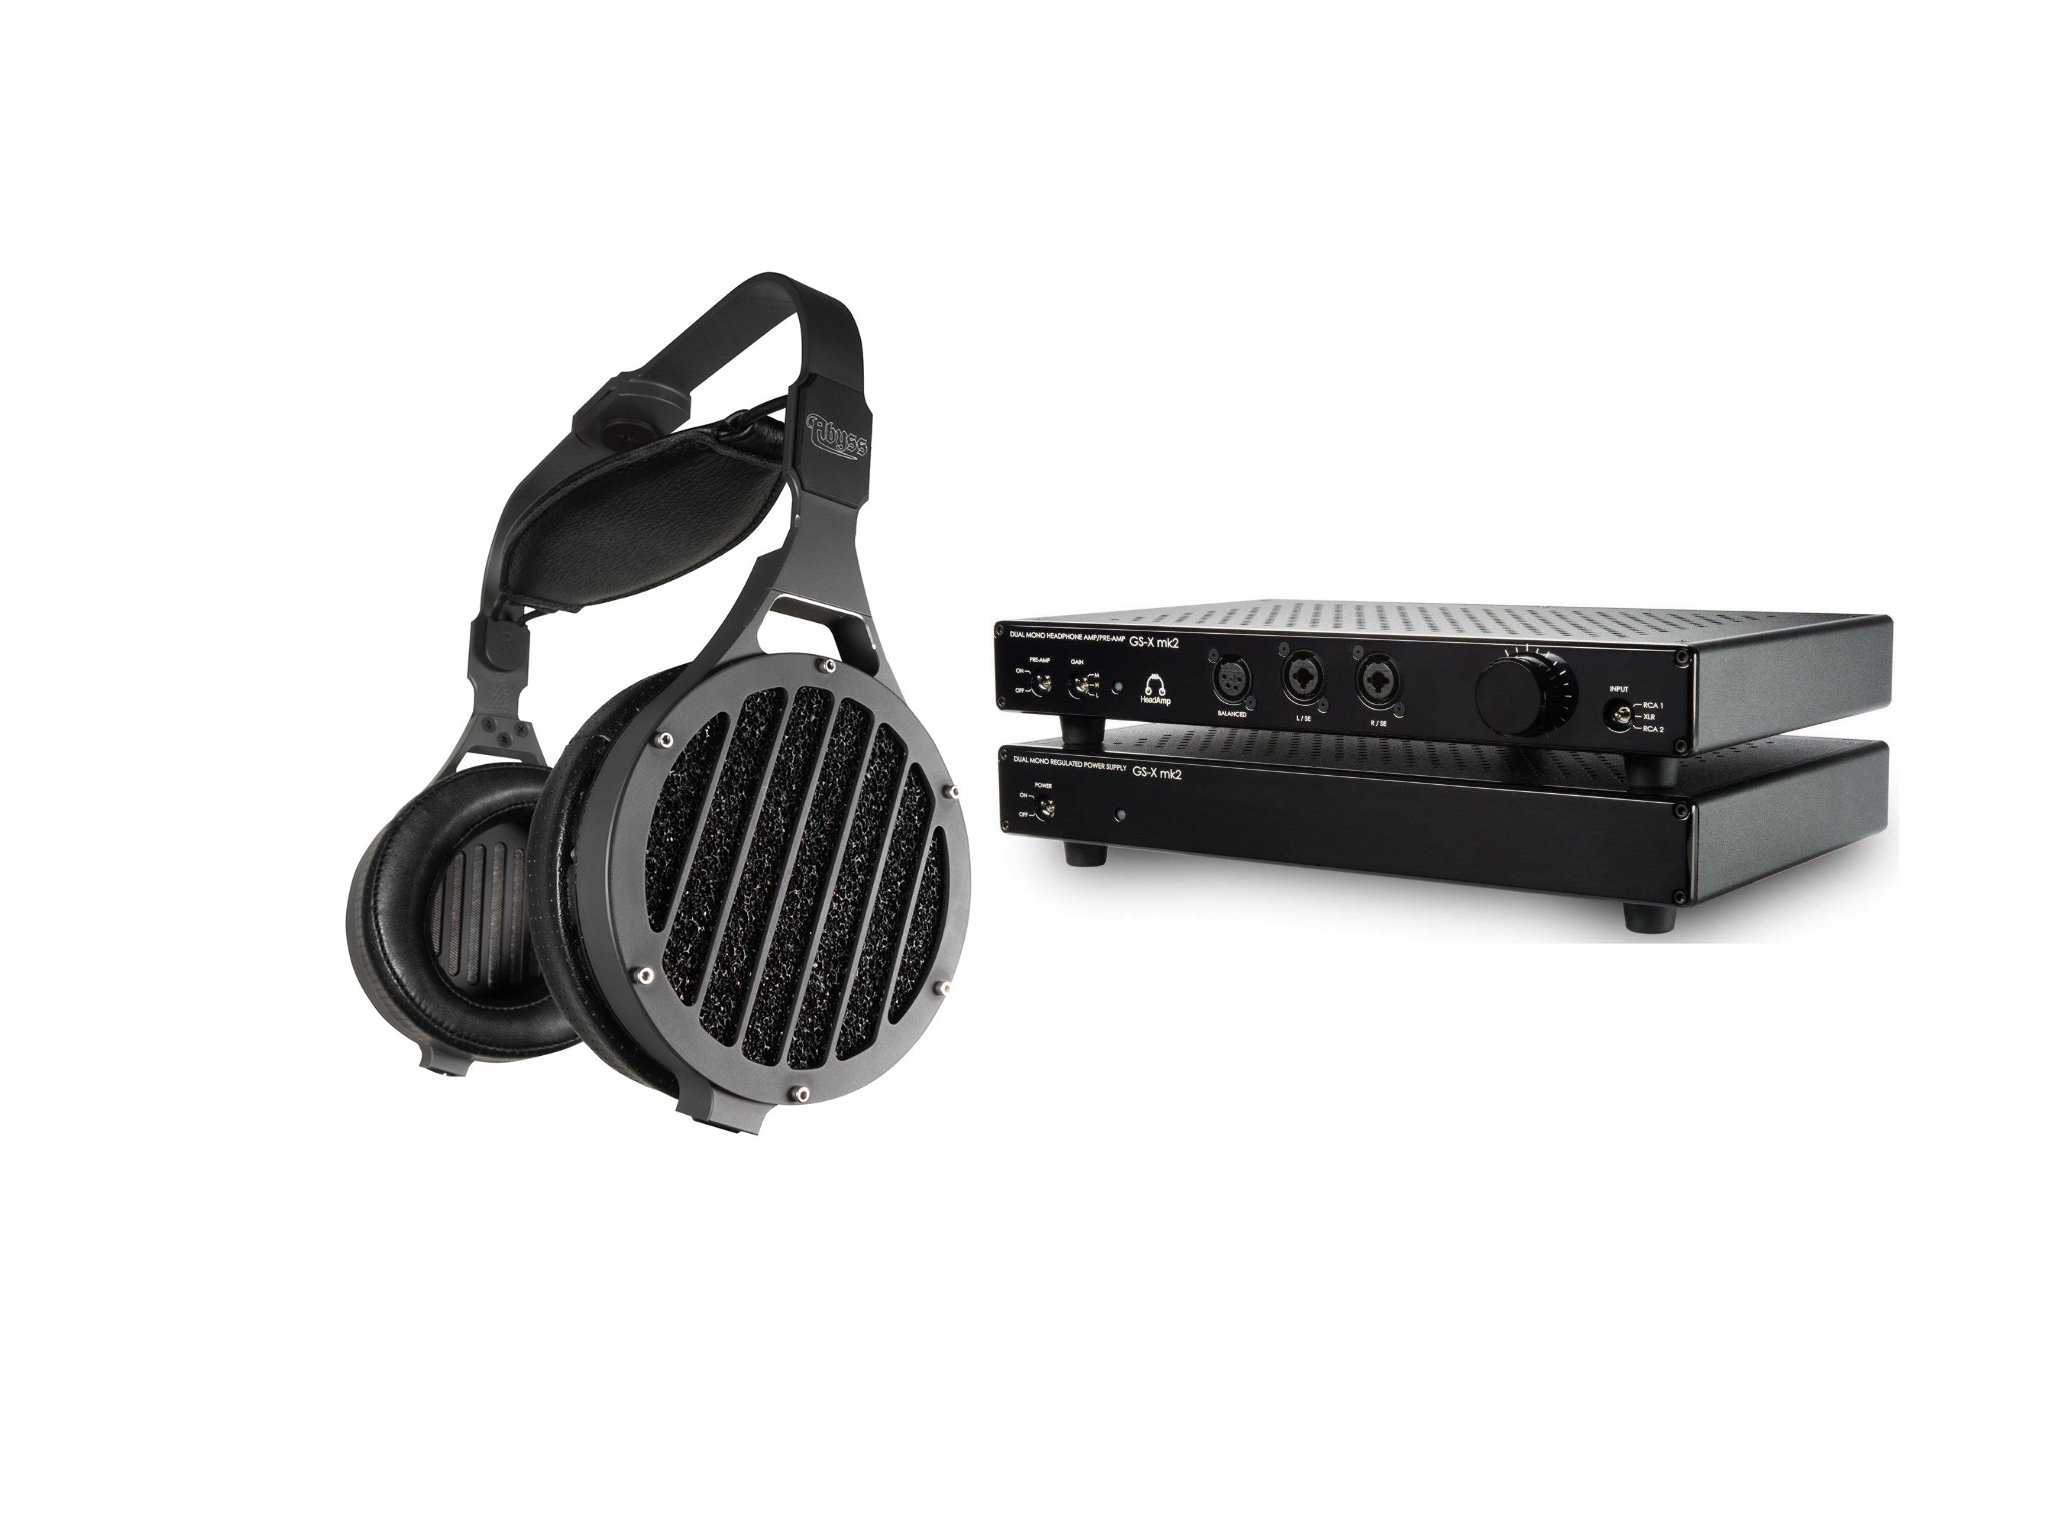 Review | Abyss AB-1266 Phi TC Headphones and  HeadAmp GSX mk2 Balanced Headphone Amplifier